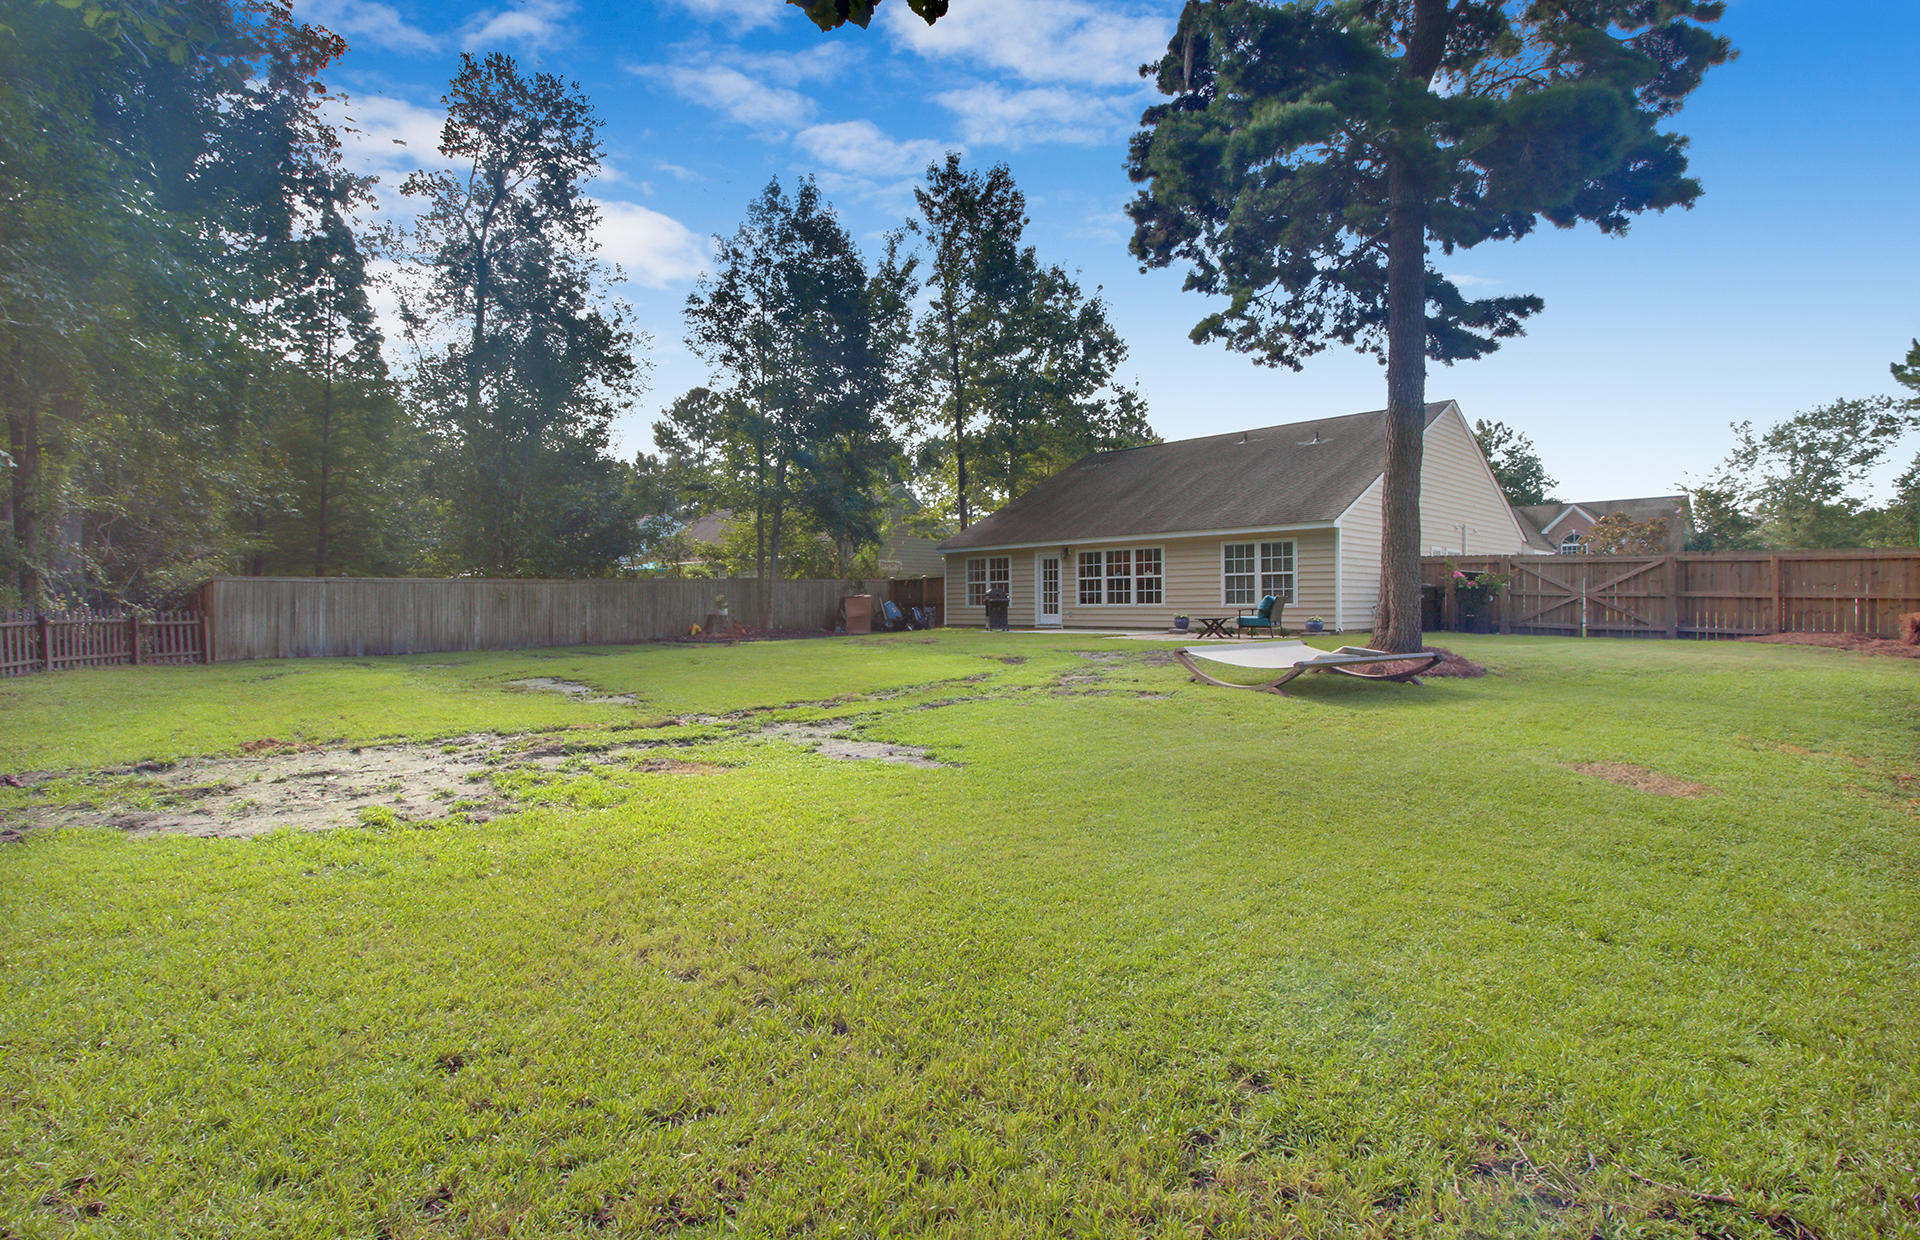 138 Thousand Oaks Circle Goose Creek, Sc 29445